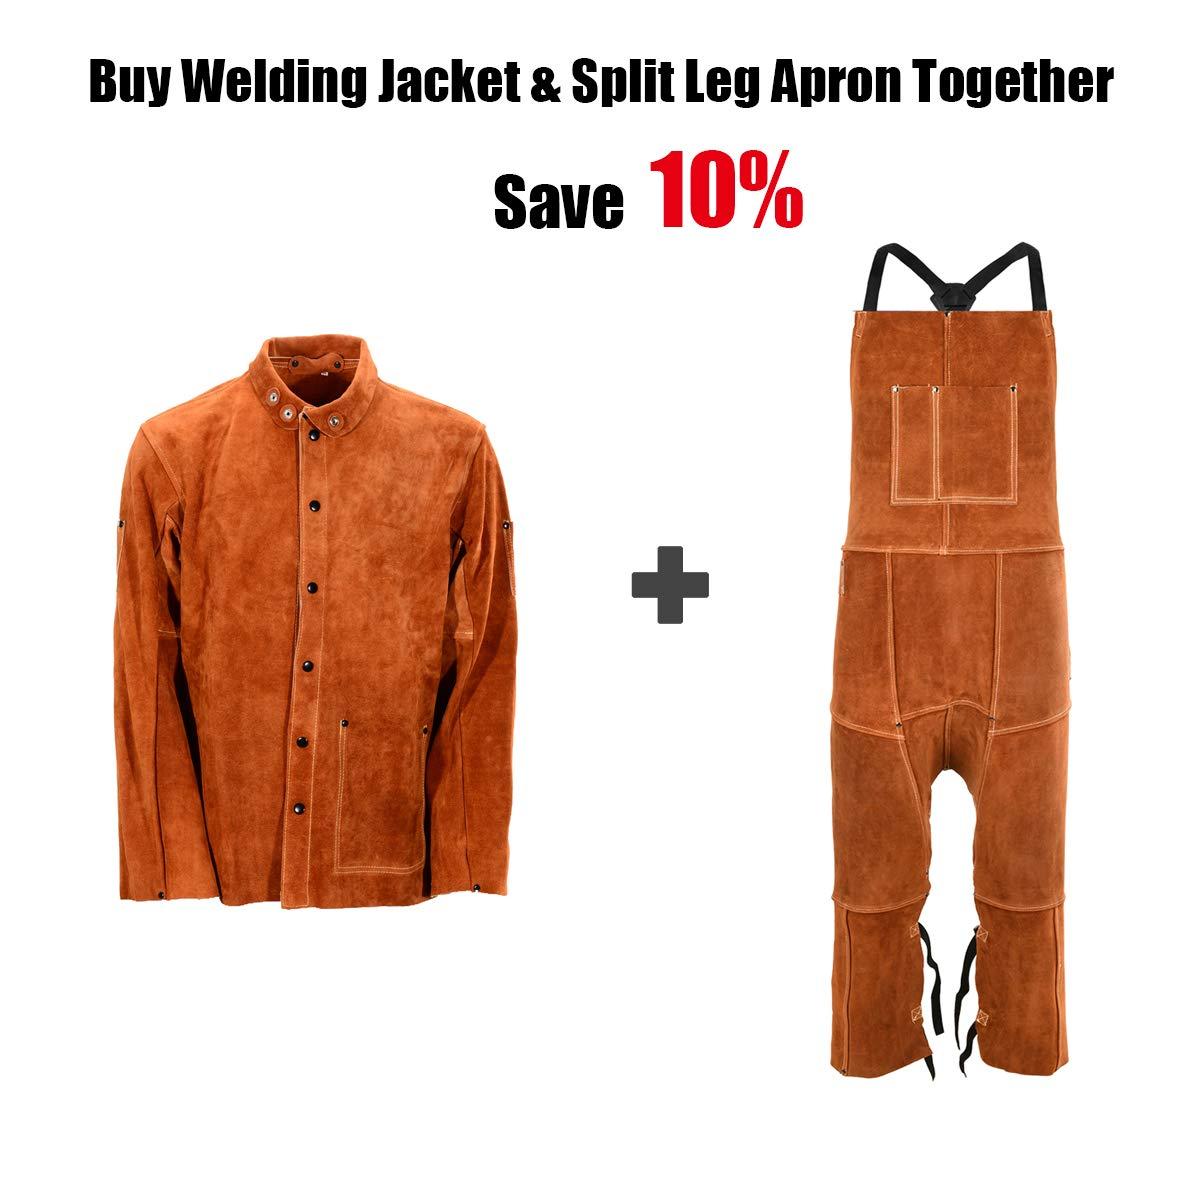 Leather Welding Apron Split Leg for Men One Size Fit Most Heavy Duty Cowhide Leather Flame Spark Heat Resistant Bib Apron by QeeLink